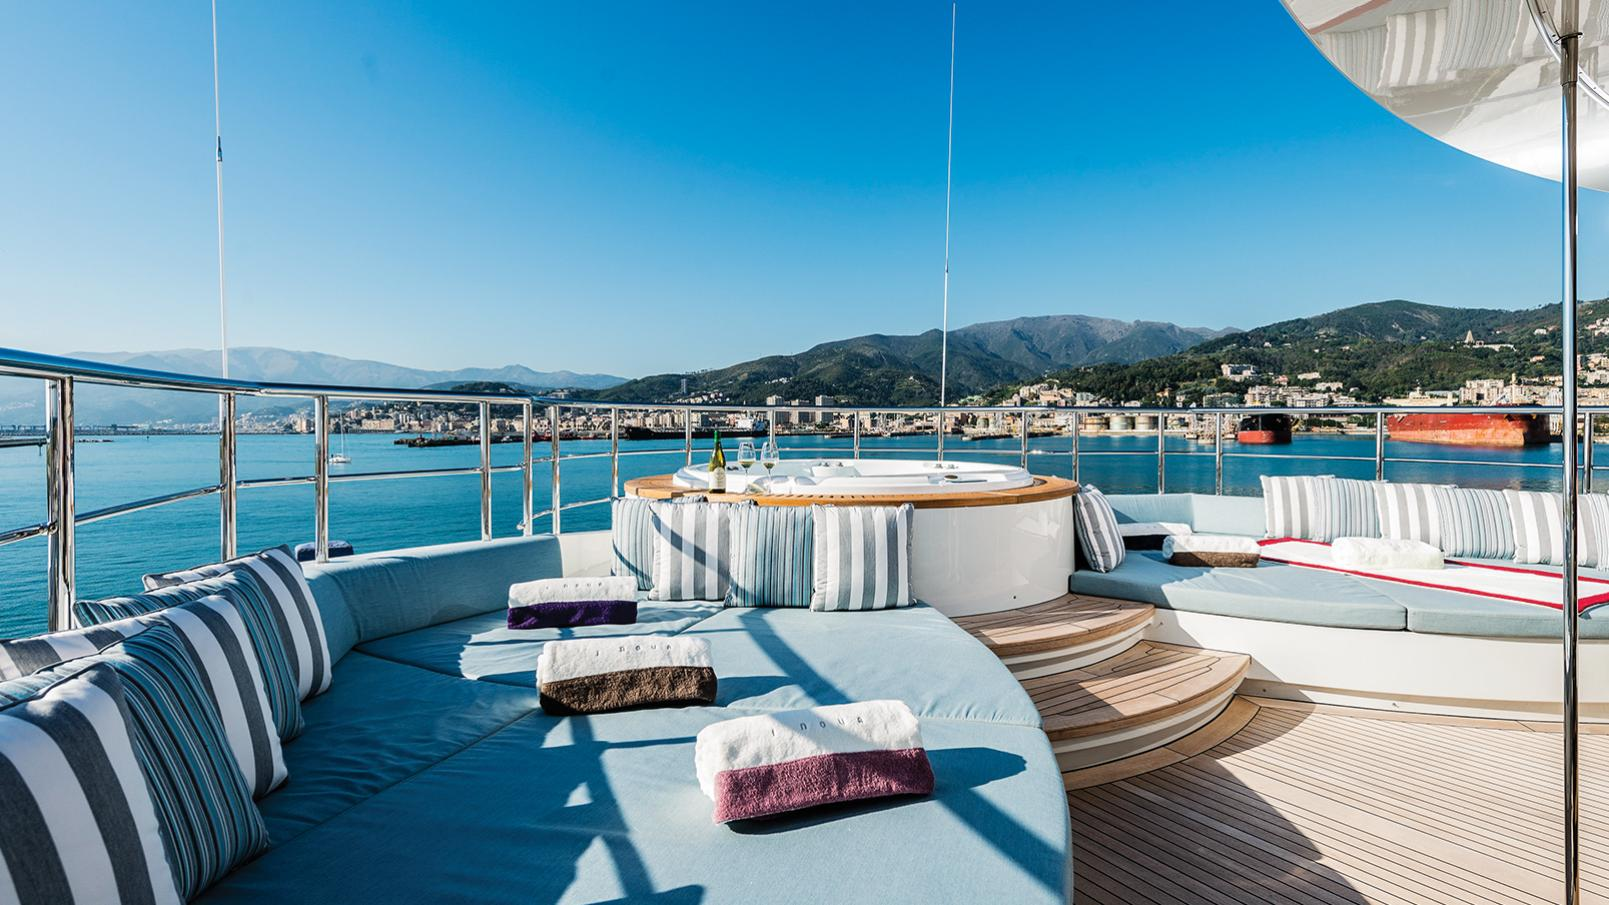 i-nova-explorer-yacht-cosmo-2013-50m-jacuzzi-deck